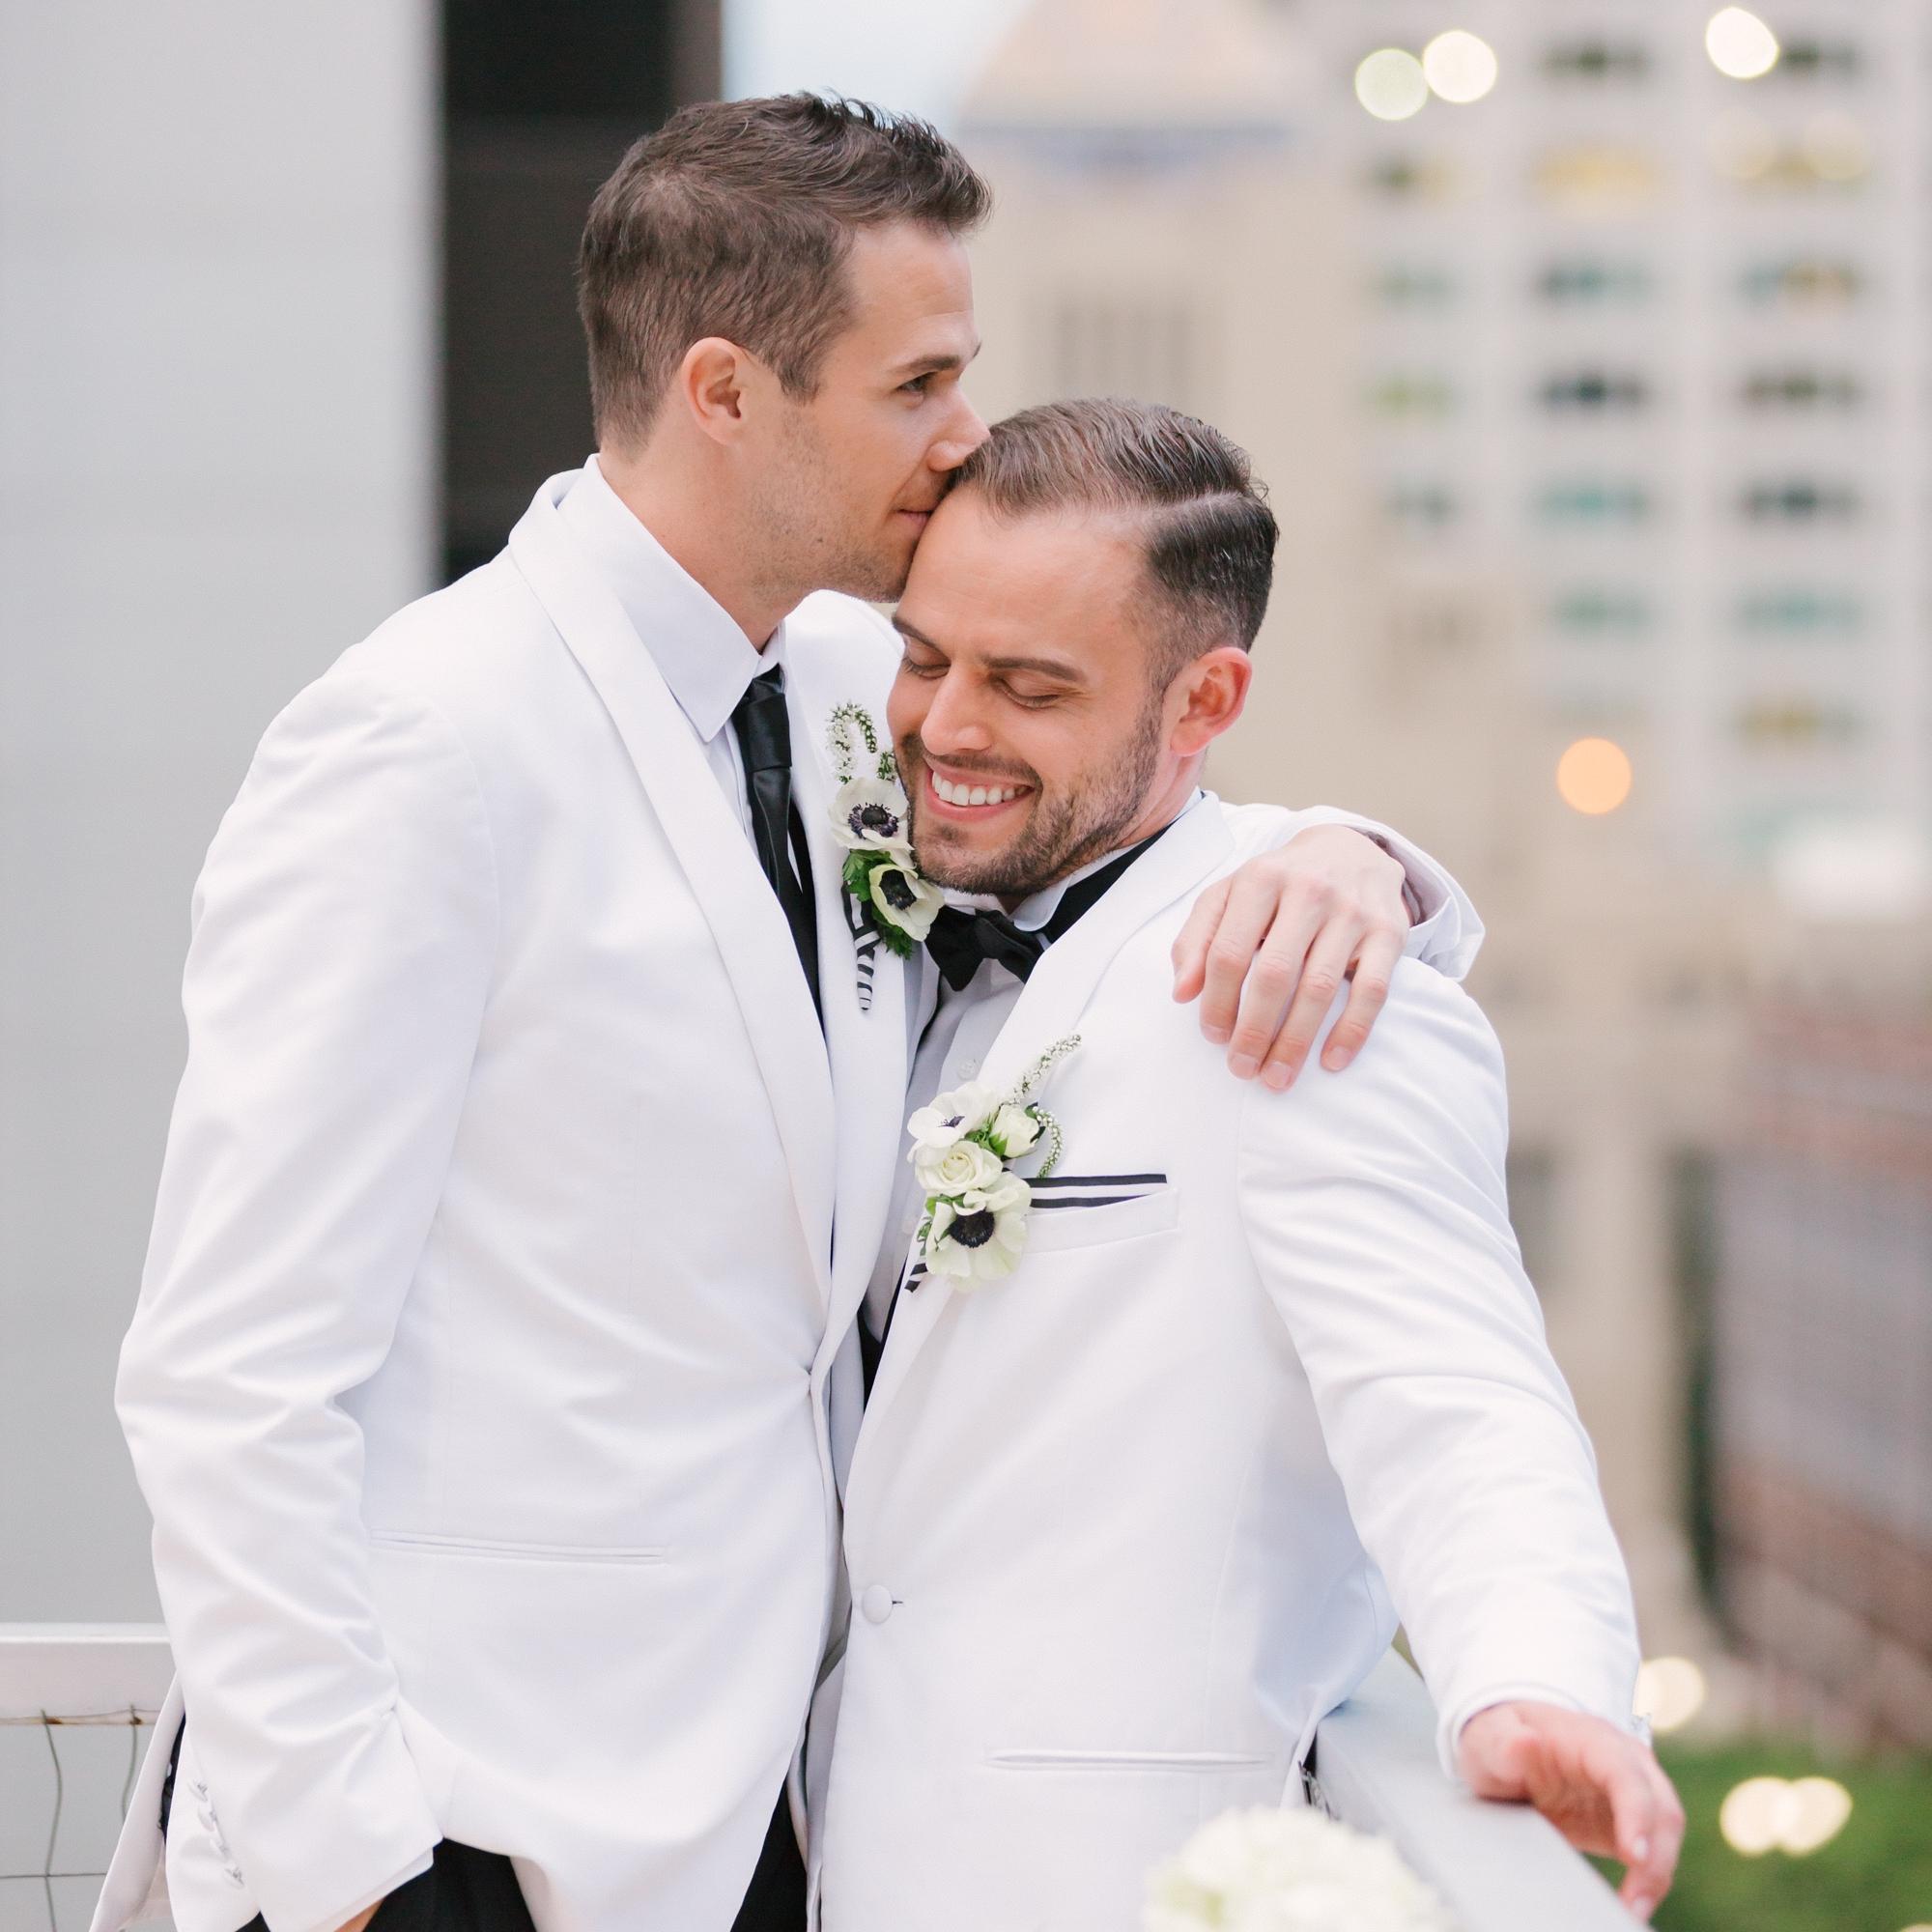 STYLED SHOOT: SAME SEX STRIPE THEMED WEDDING